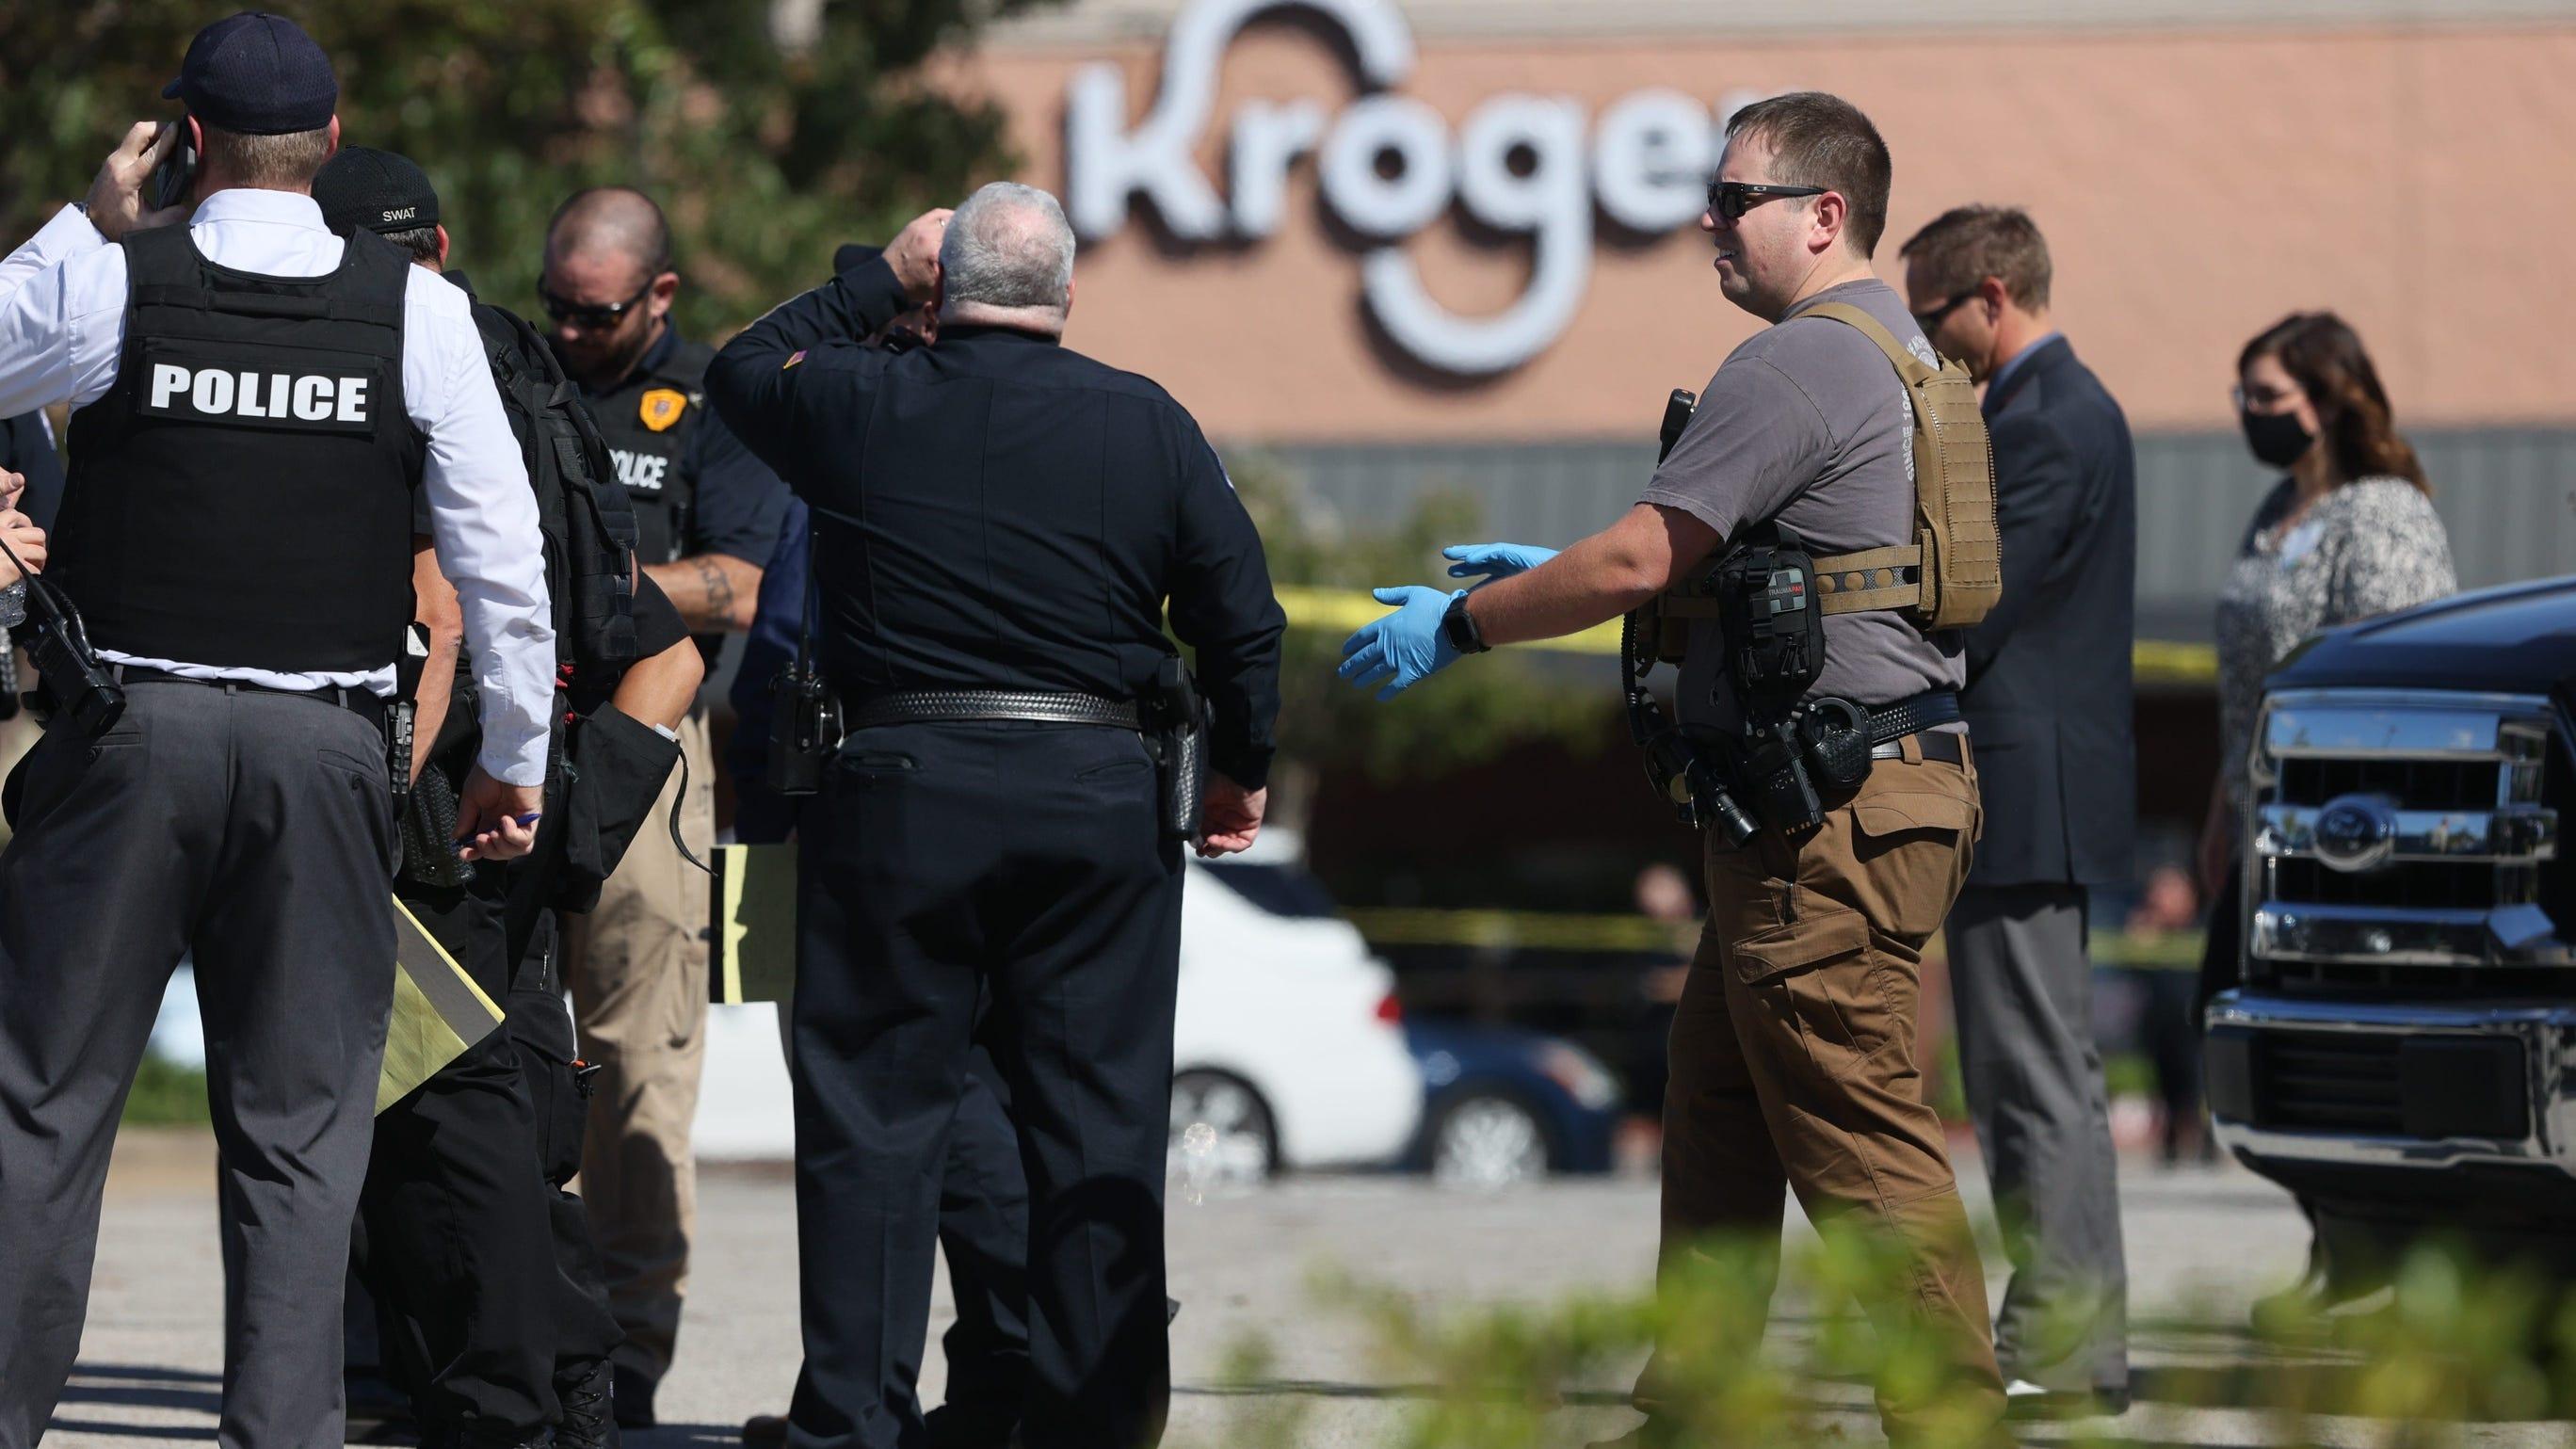 Kroger store gunman kills 1, shoots 13 others before killing himself